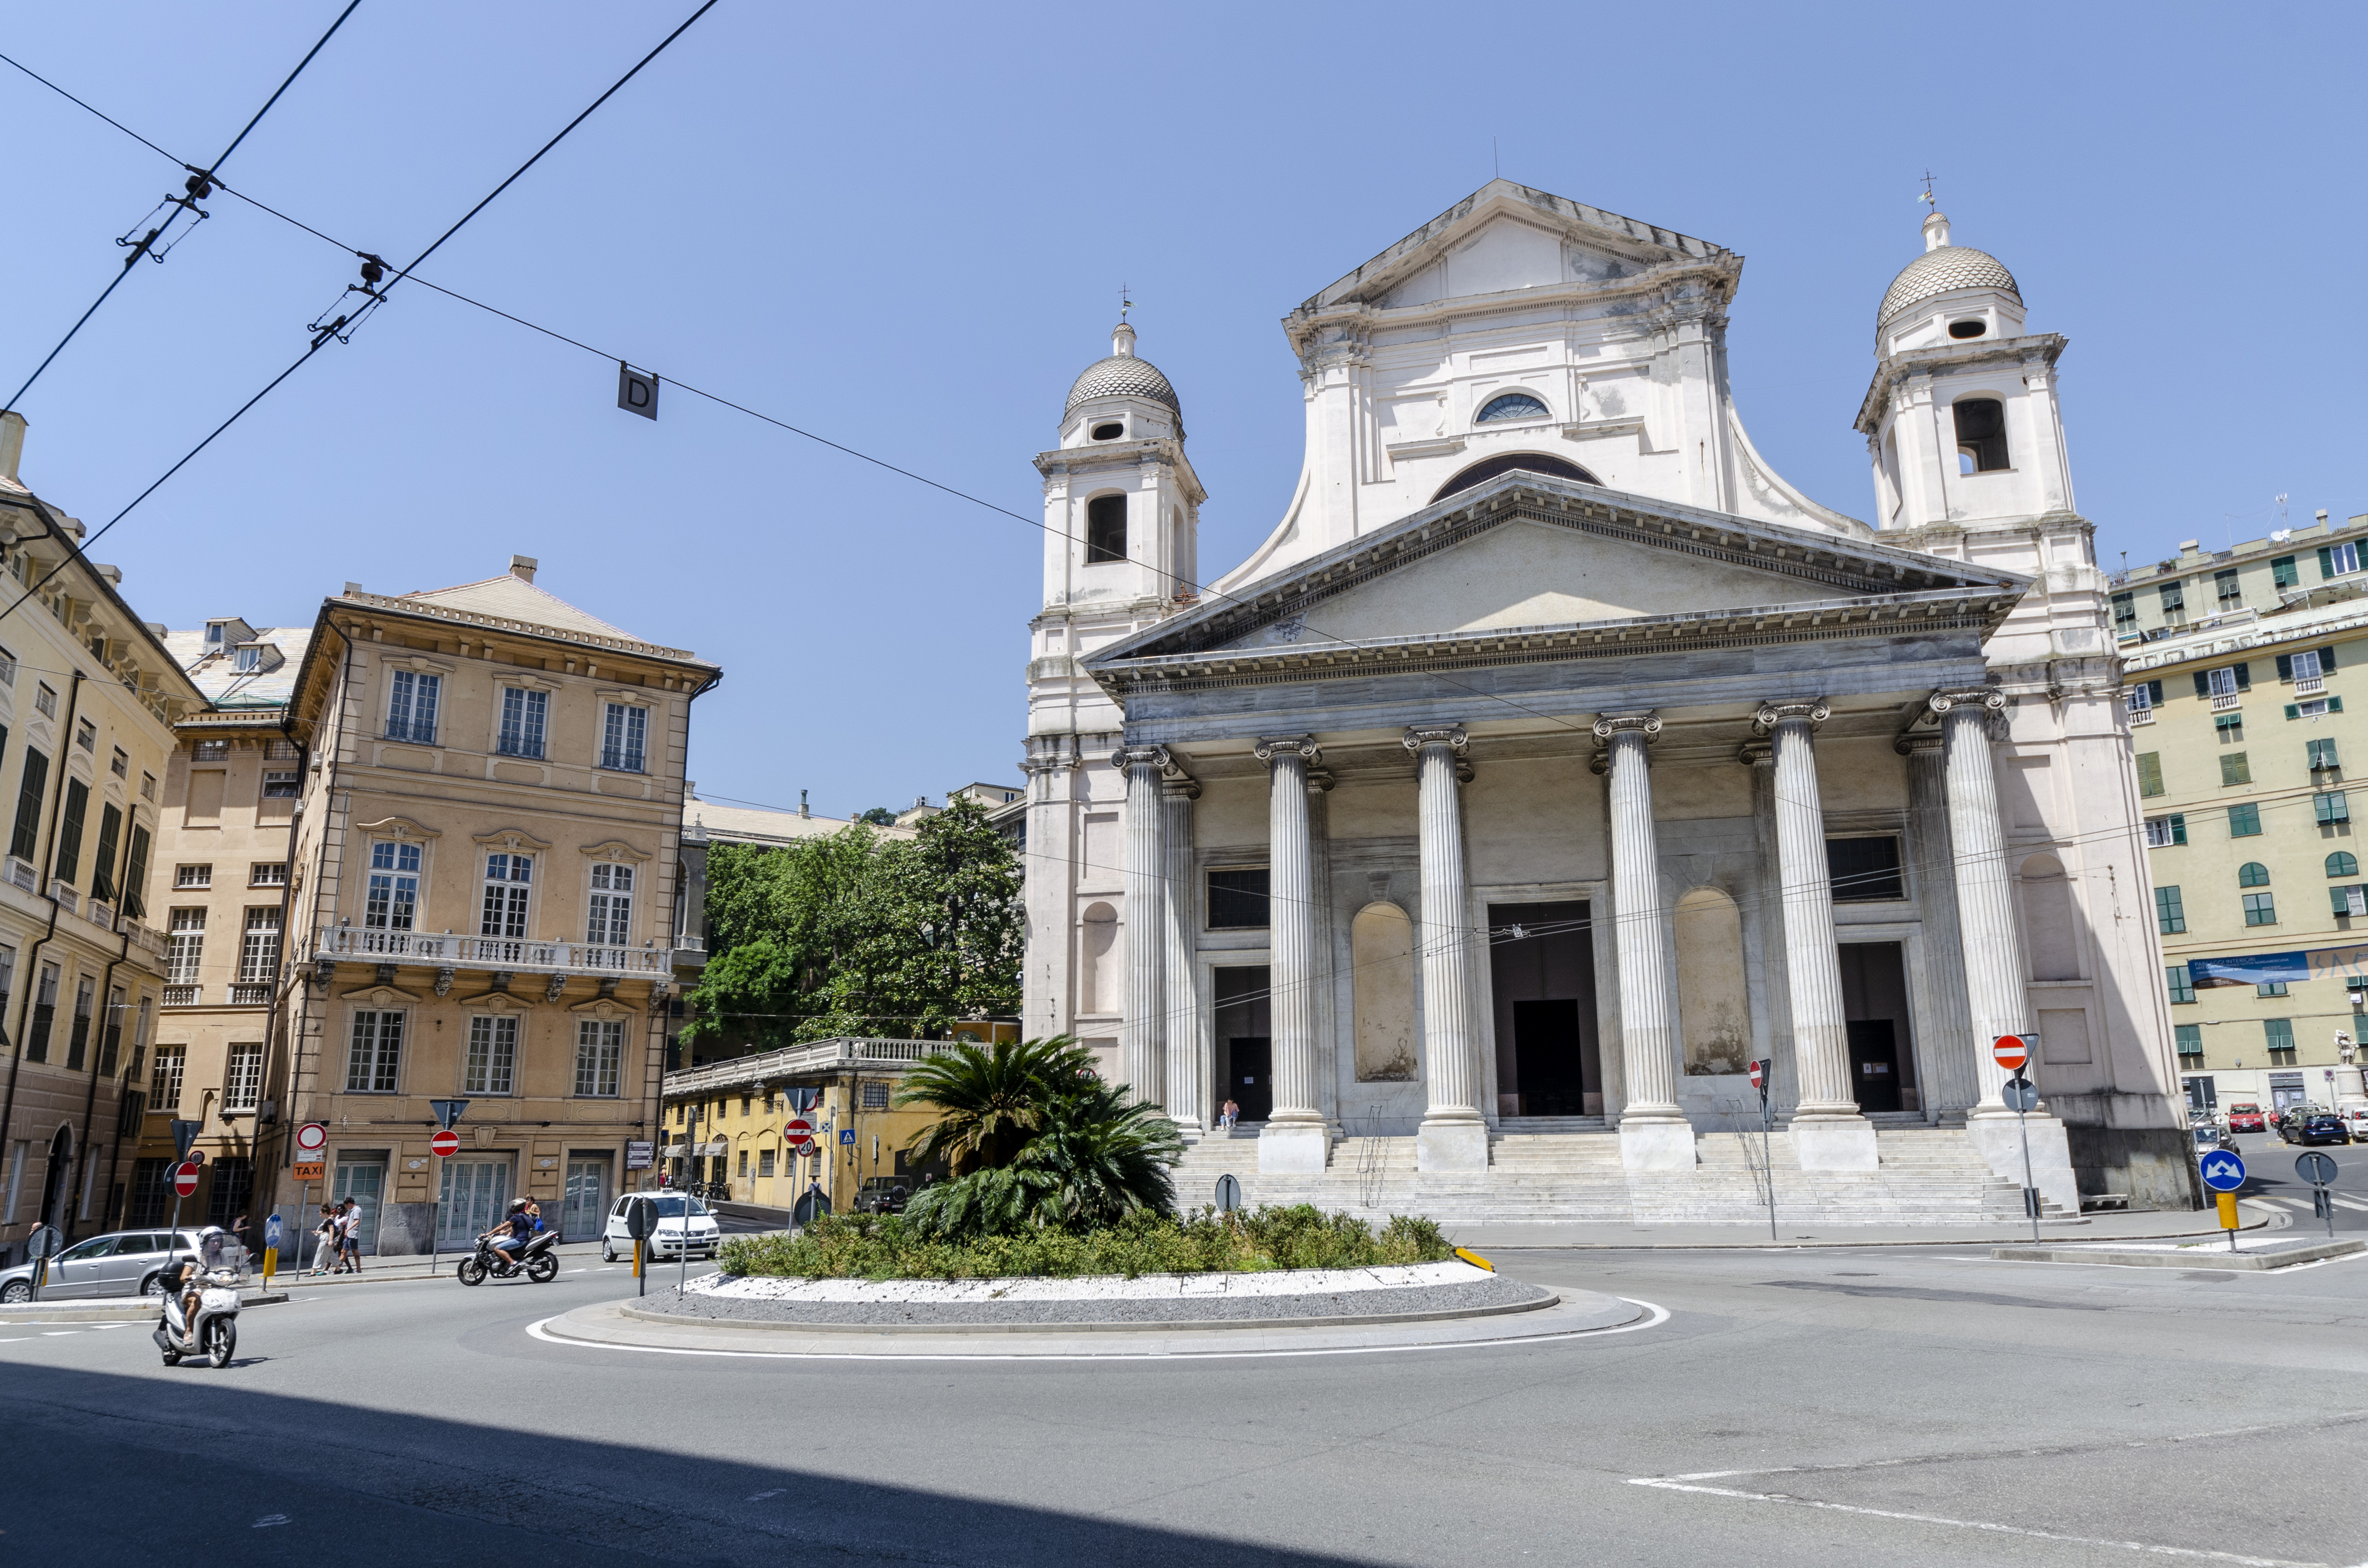 Apartment Hintown Piazza del Roso Genova Universitaria photo 18451193